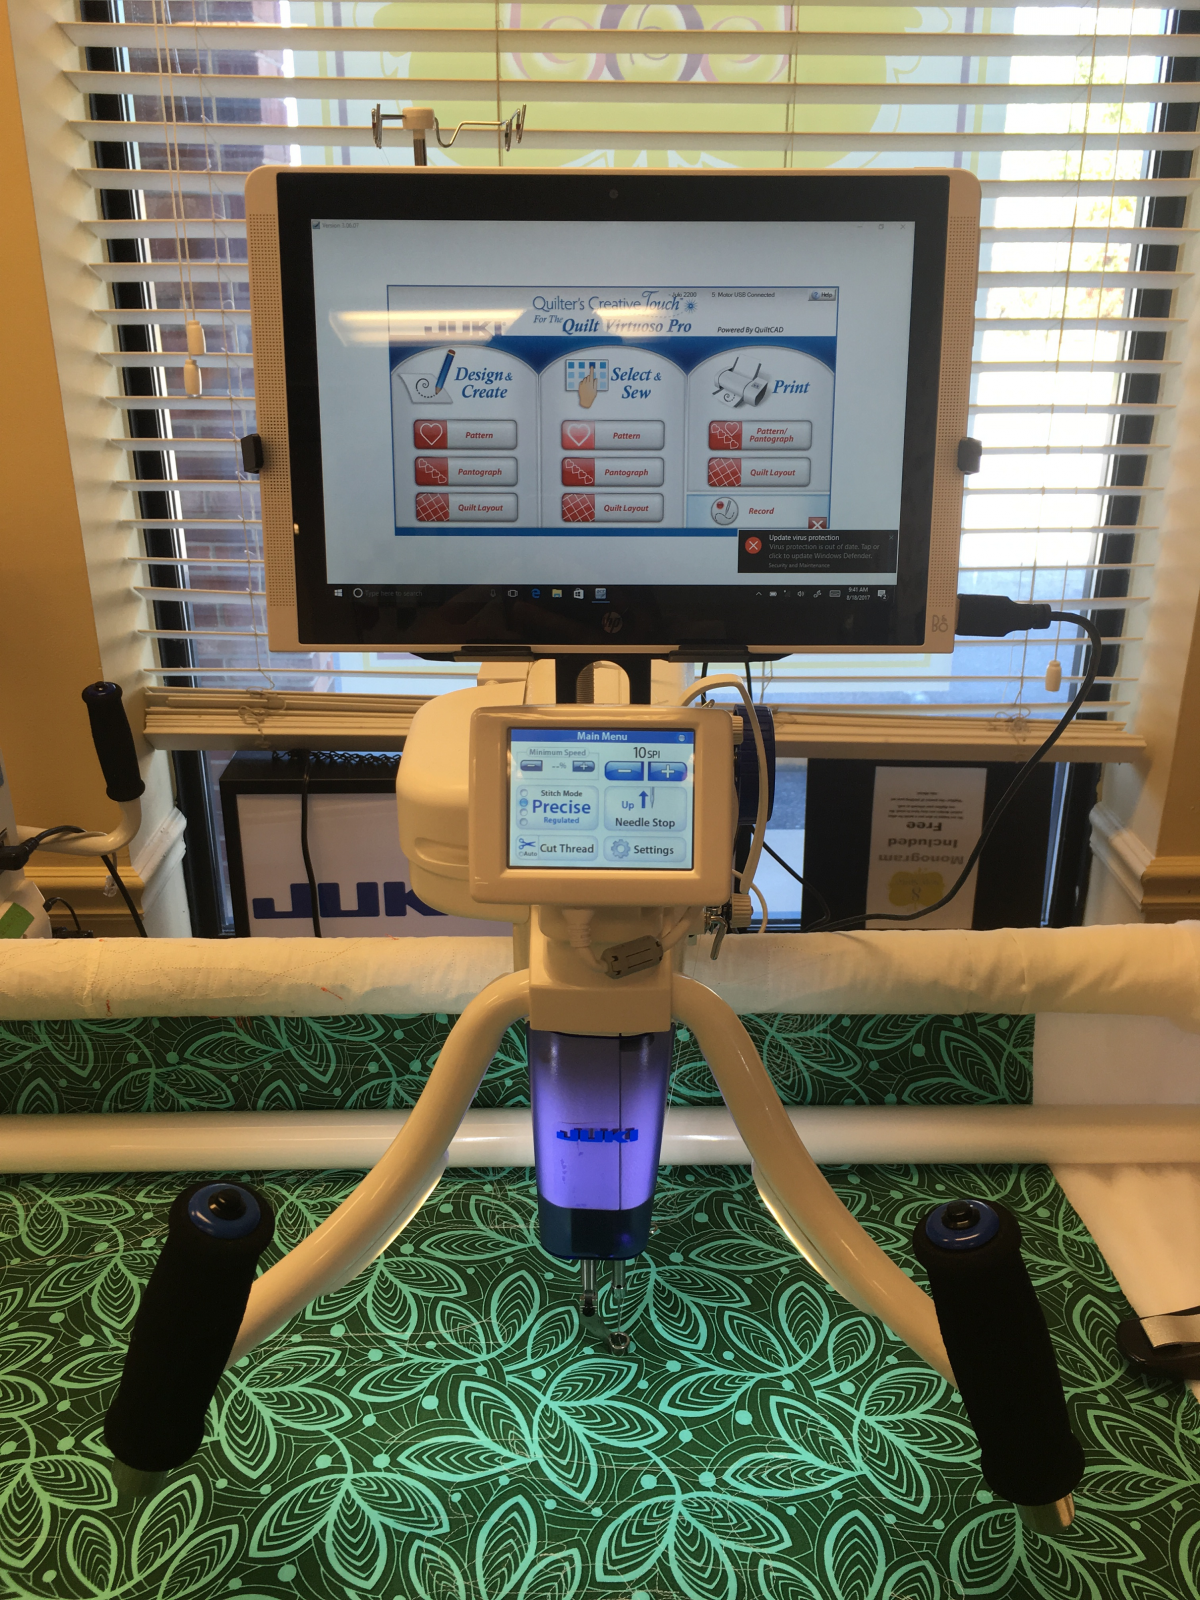 Juki Quilter's Creative Software + Robotics